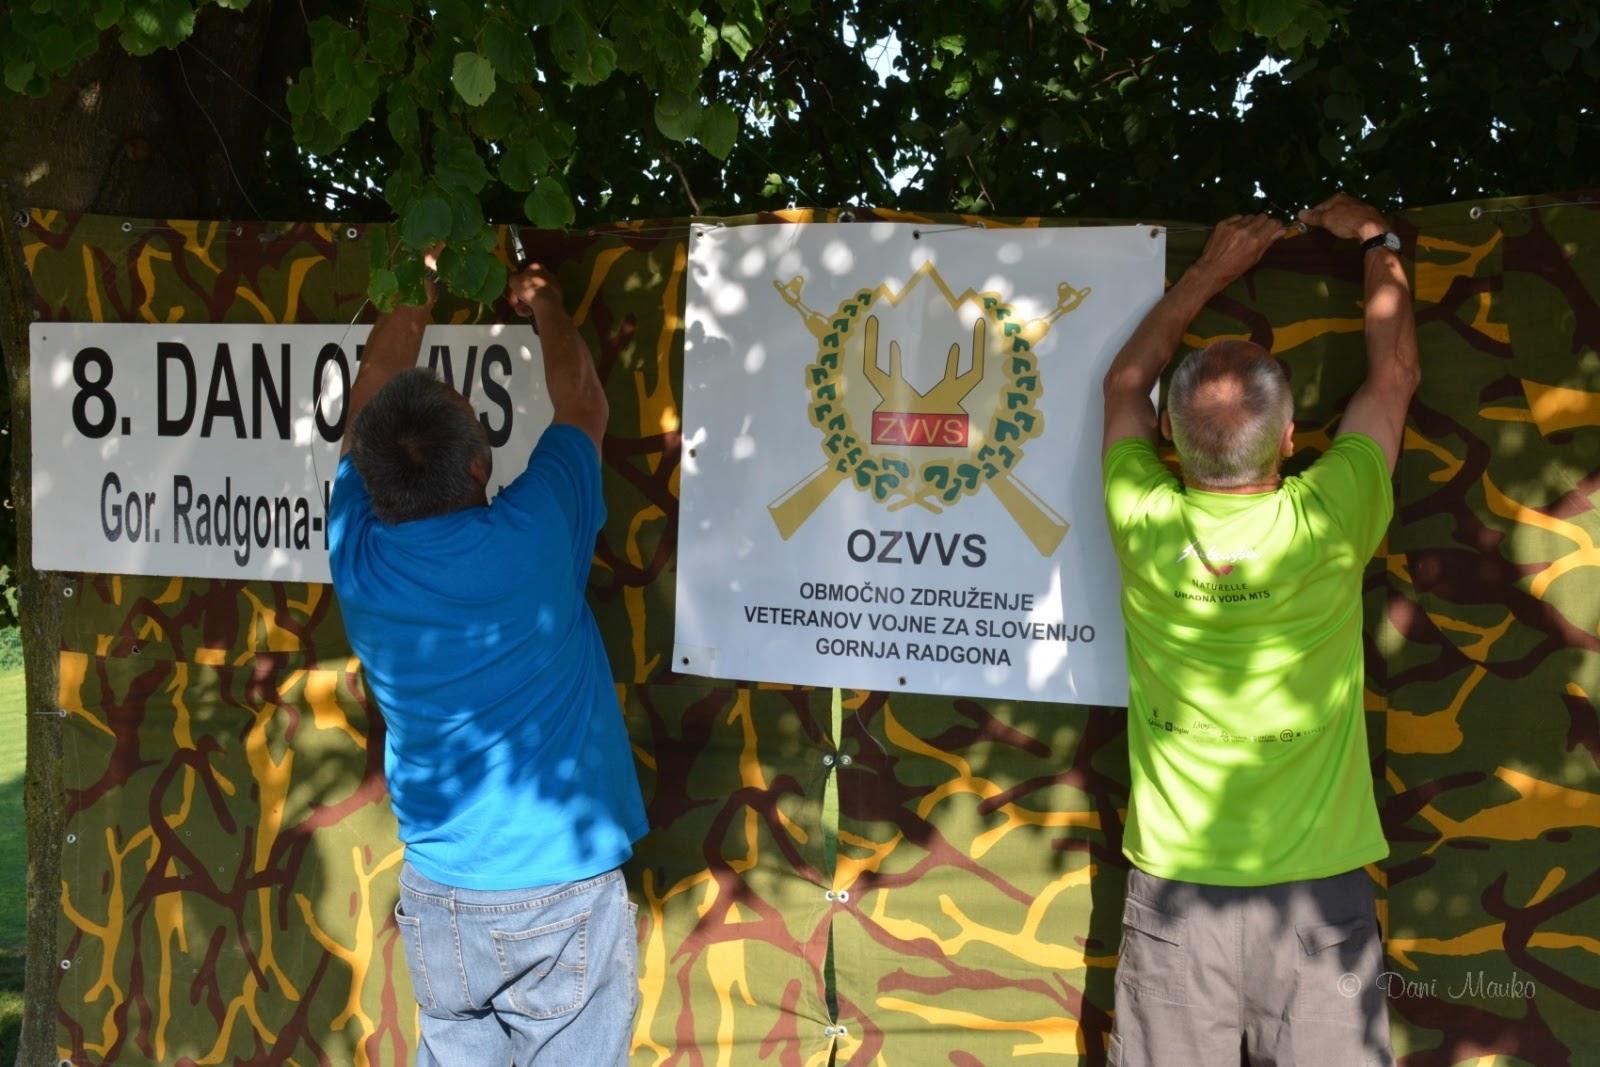 8. dan veteranov OZ VVS Gornja Radgona - Foto Dani Mauko